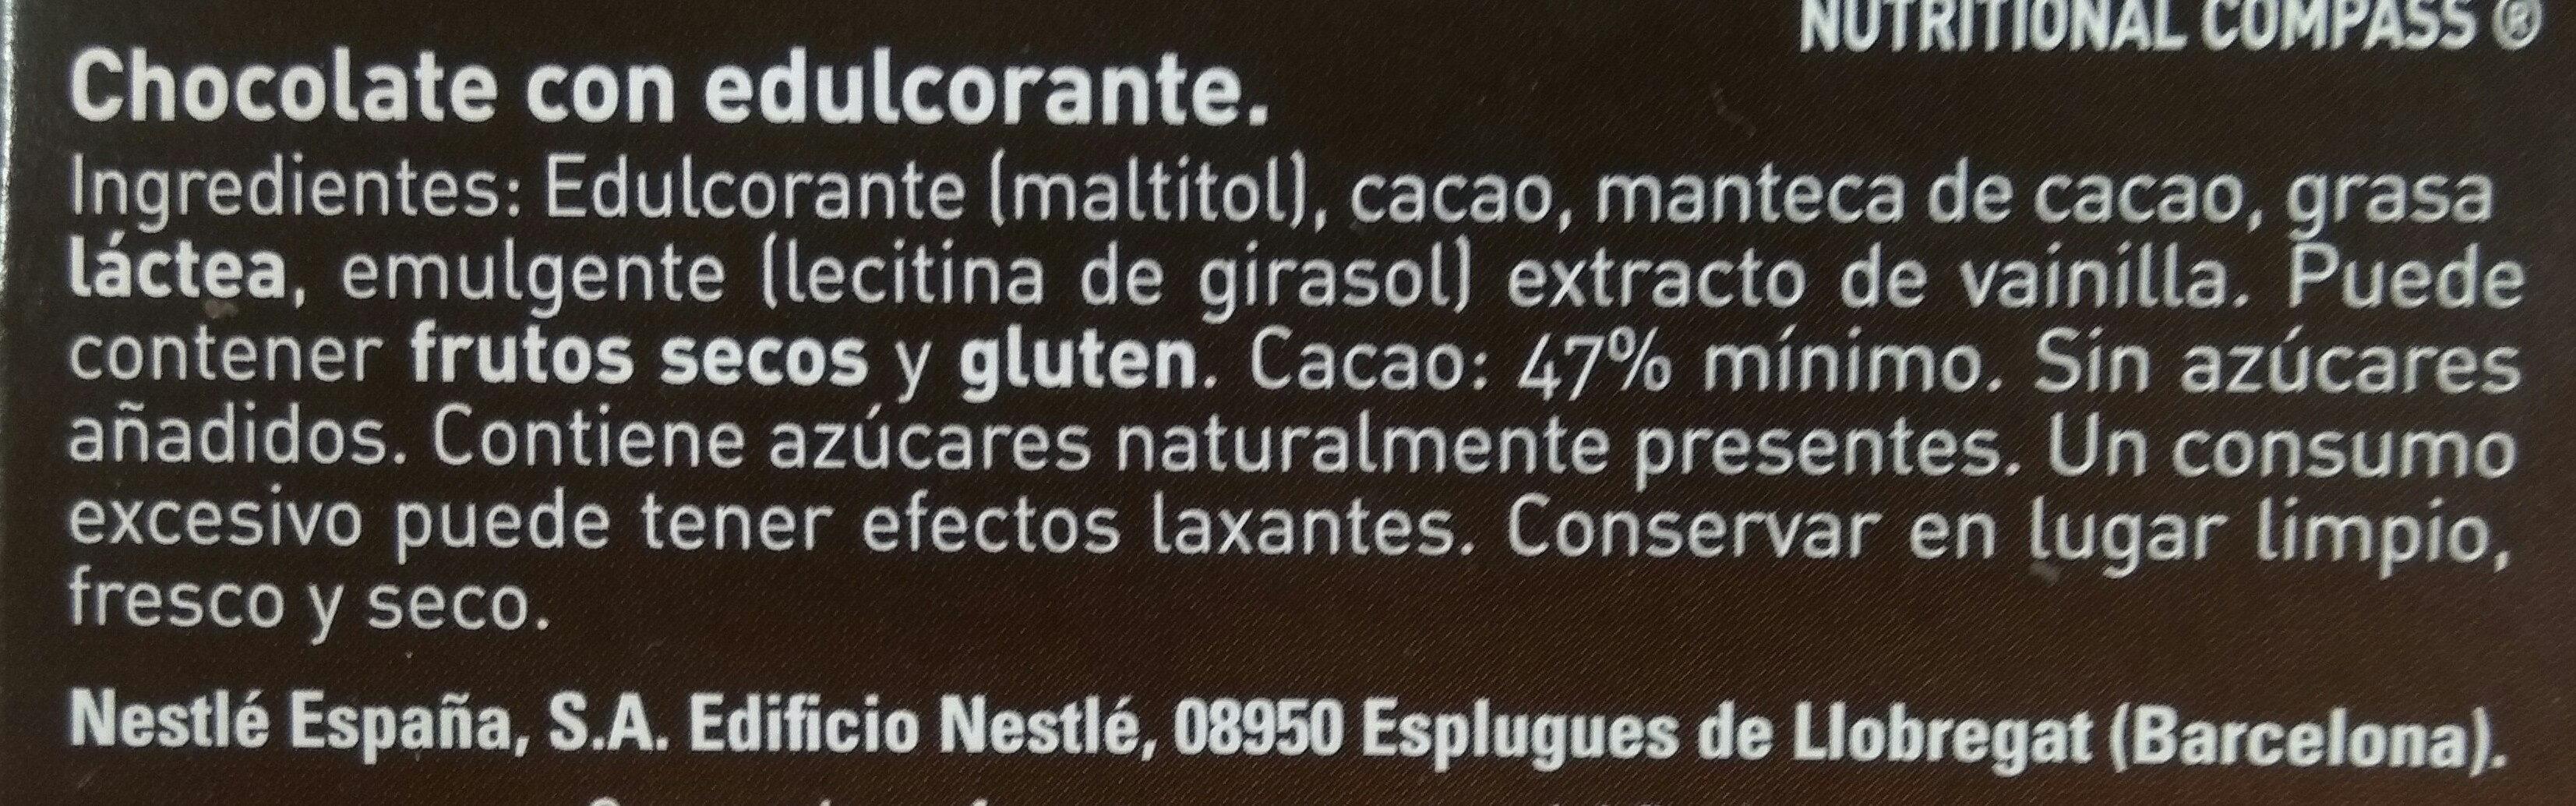 Chocolate Nestlé Negro Sin Azúcar - Ingredients